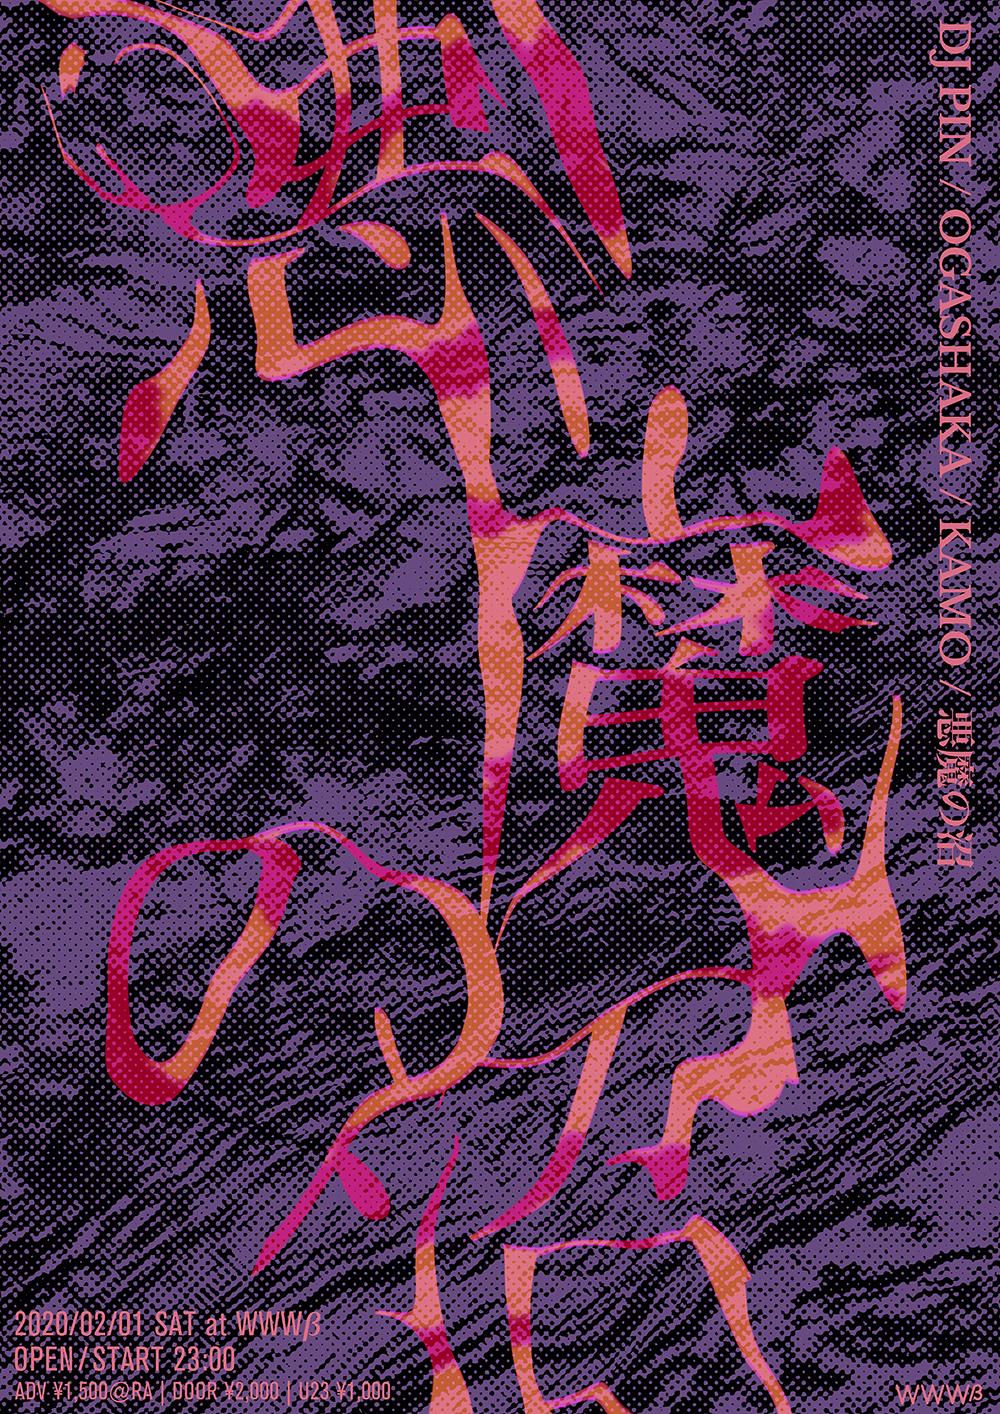 DJ PIN [浦添/沖縄] / OGASHAKA [札幌] / KAMO / 悪魔の沼 (Compuma / Dr.Nishimura / Awano)